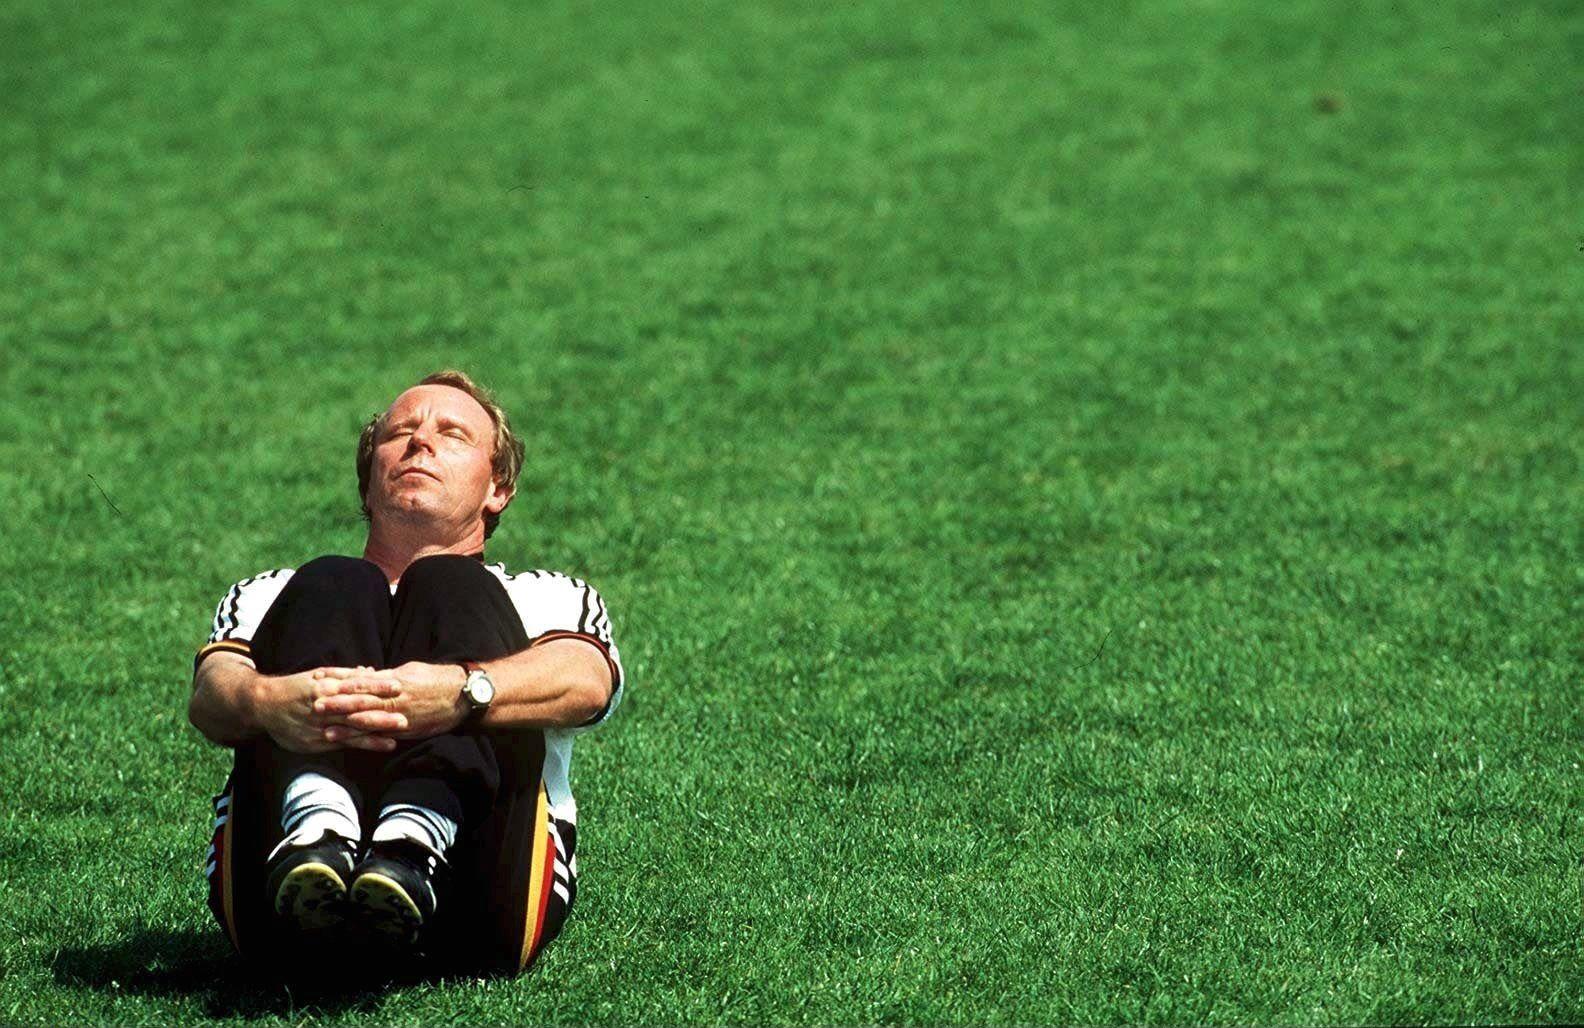 FUSSBALL: EURO 1996 DFB